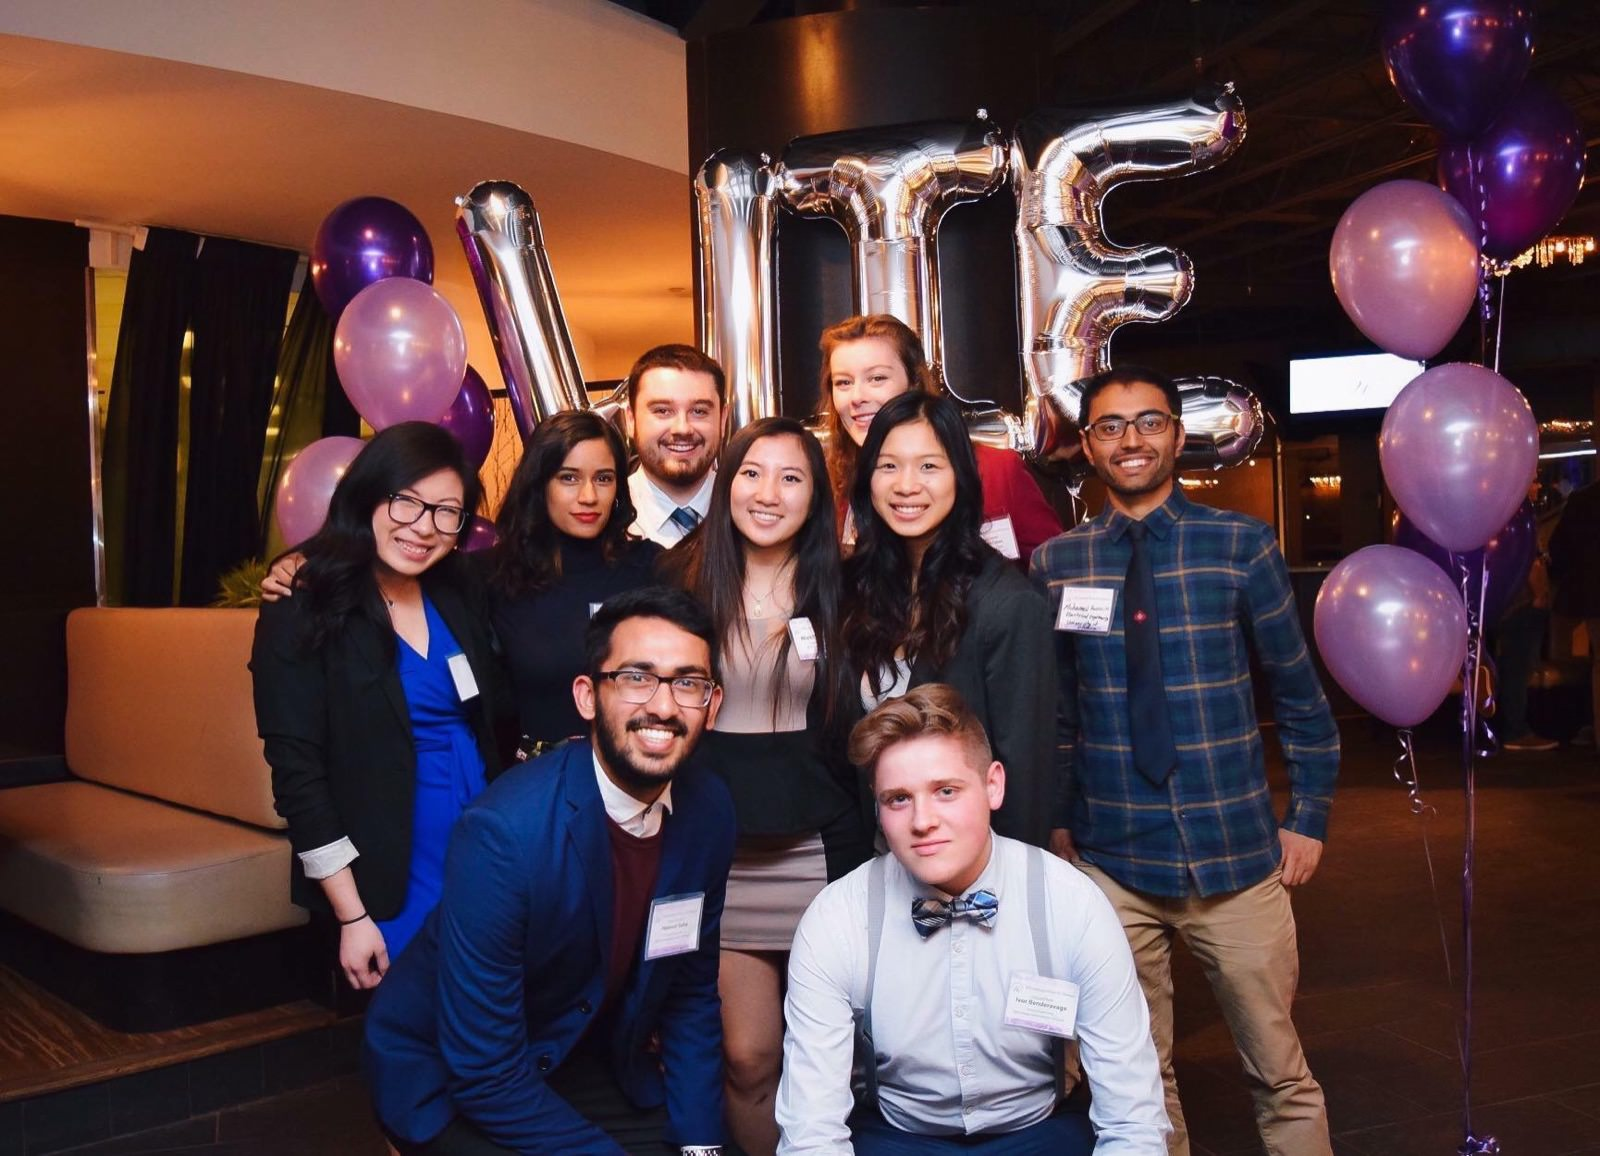 IEEE uOttawa Student Branch 2017/2018